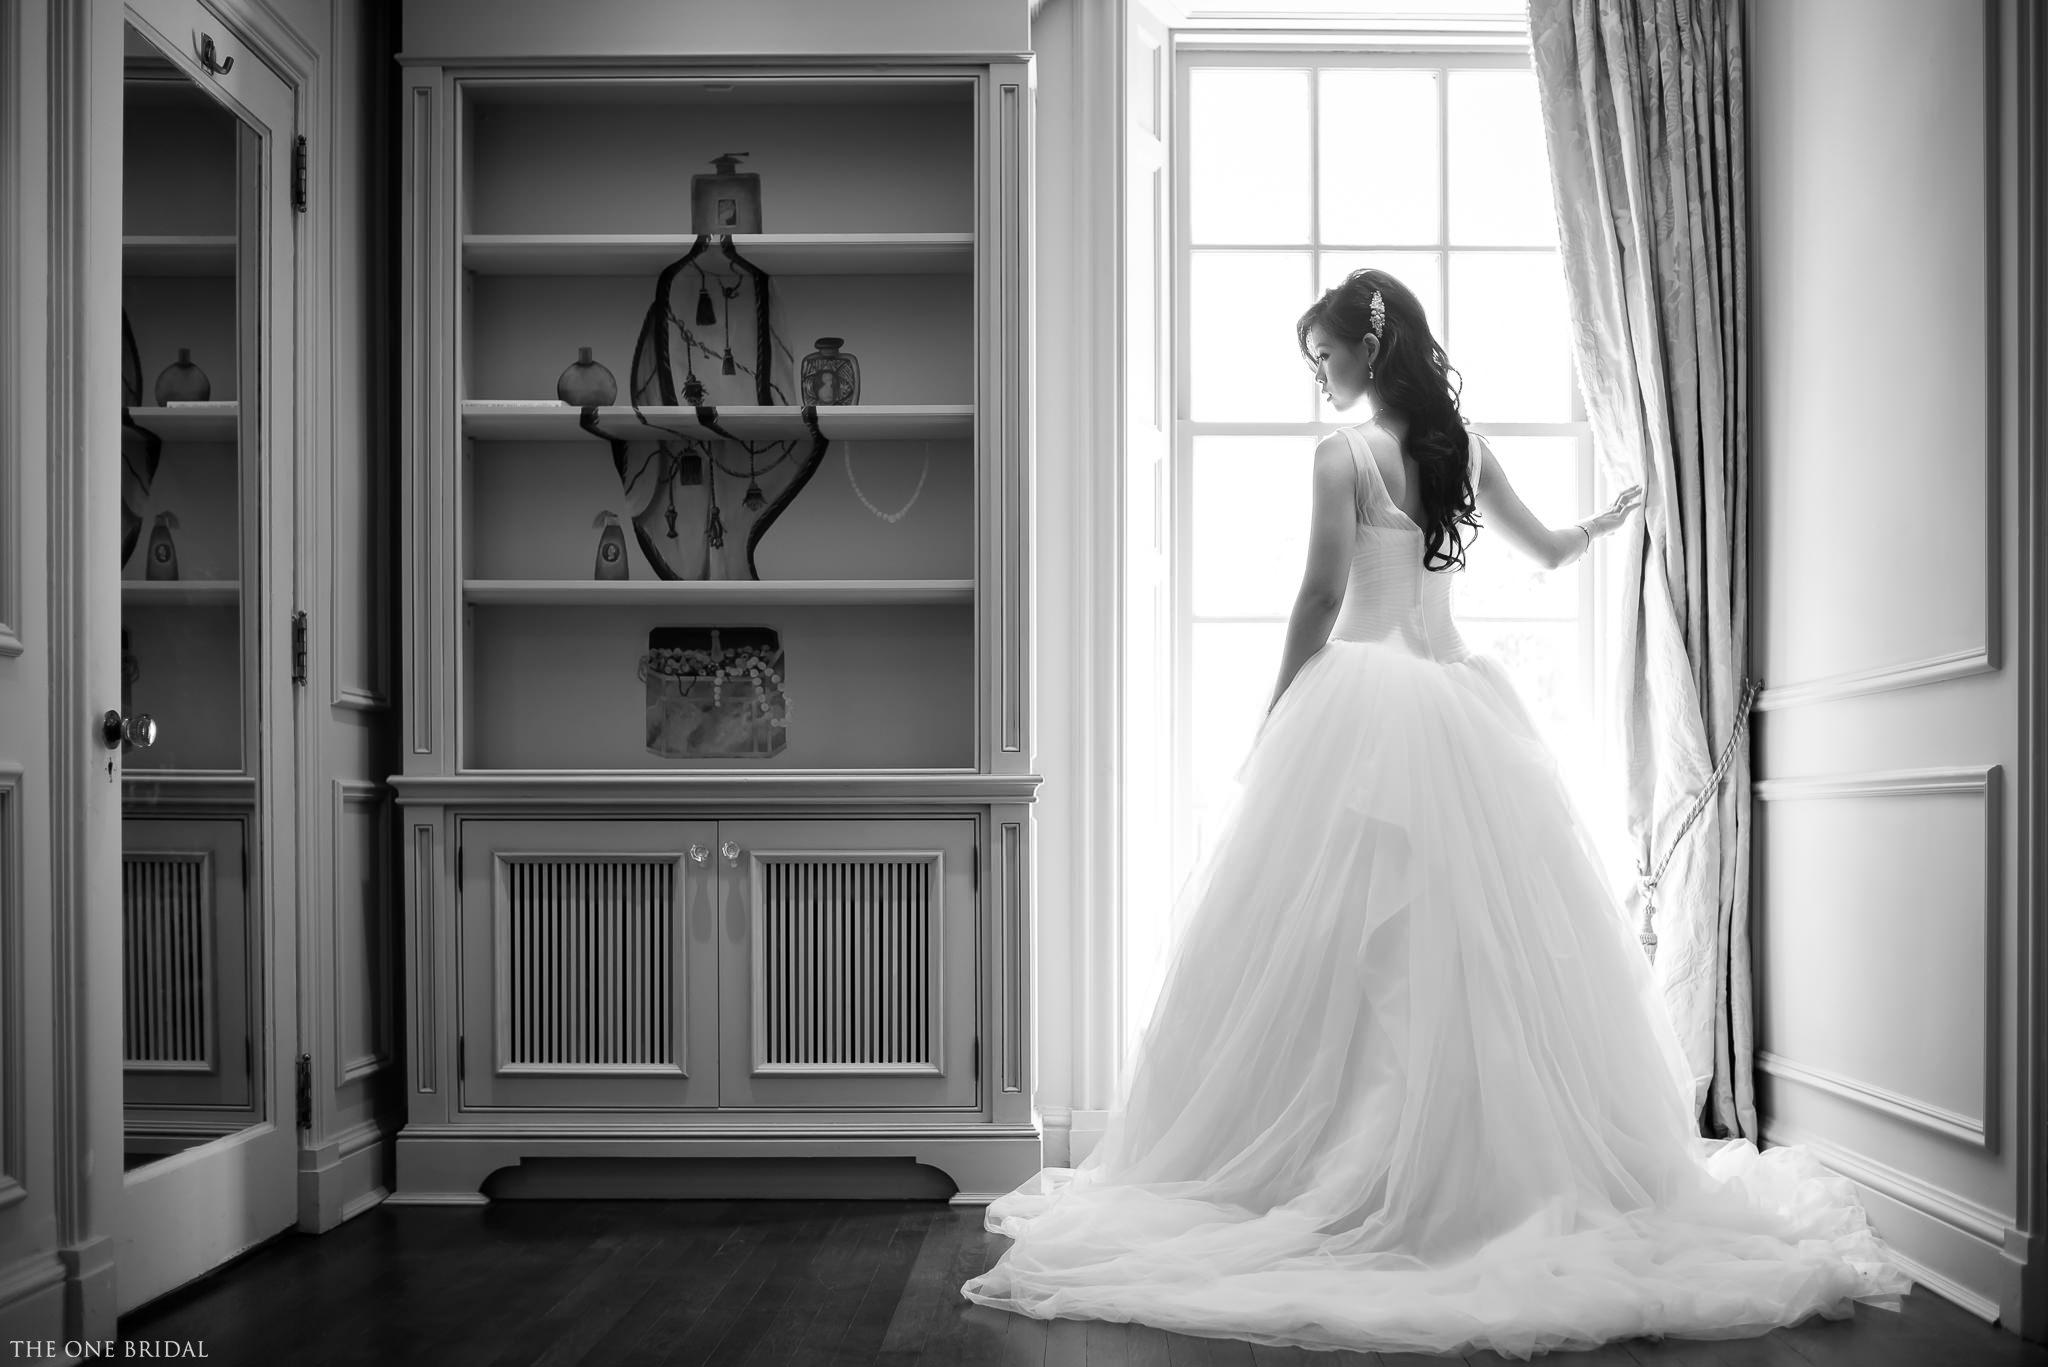 estates-of-sunnybrook-mclean-house-wedding-the-one-bridal-10